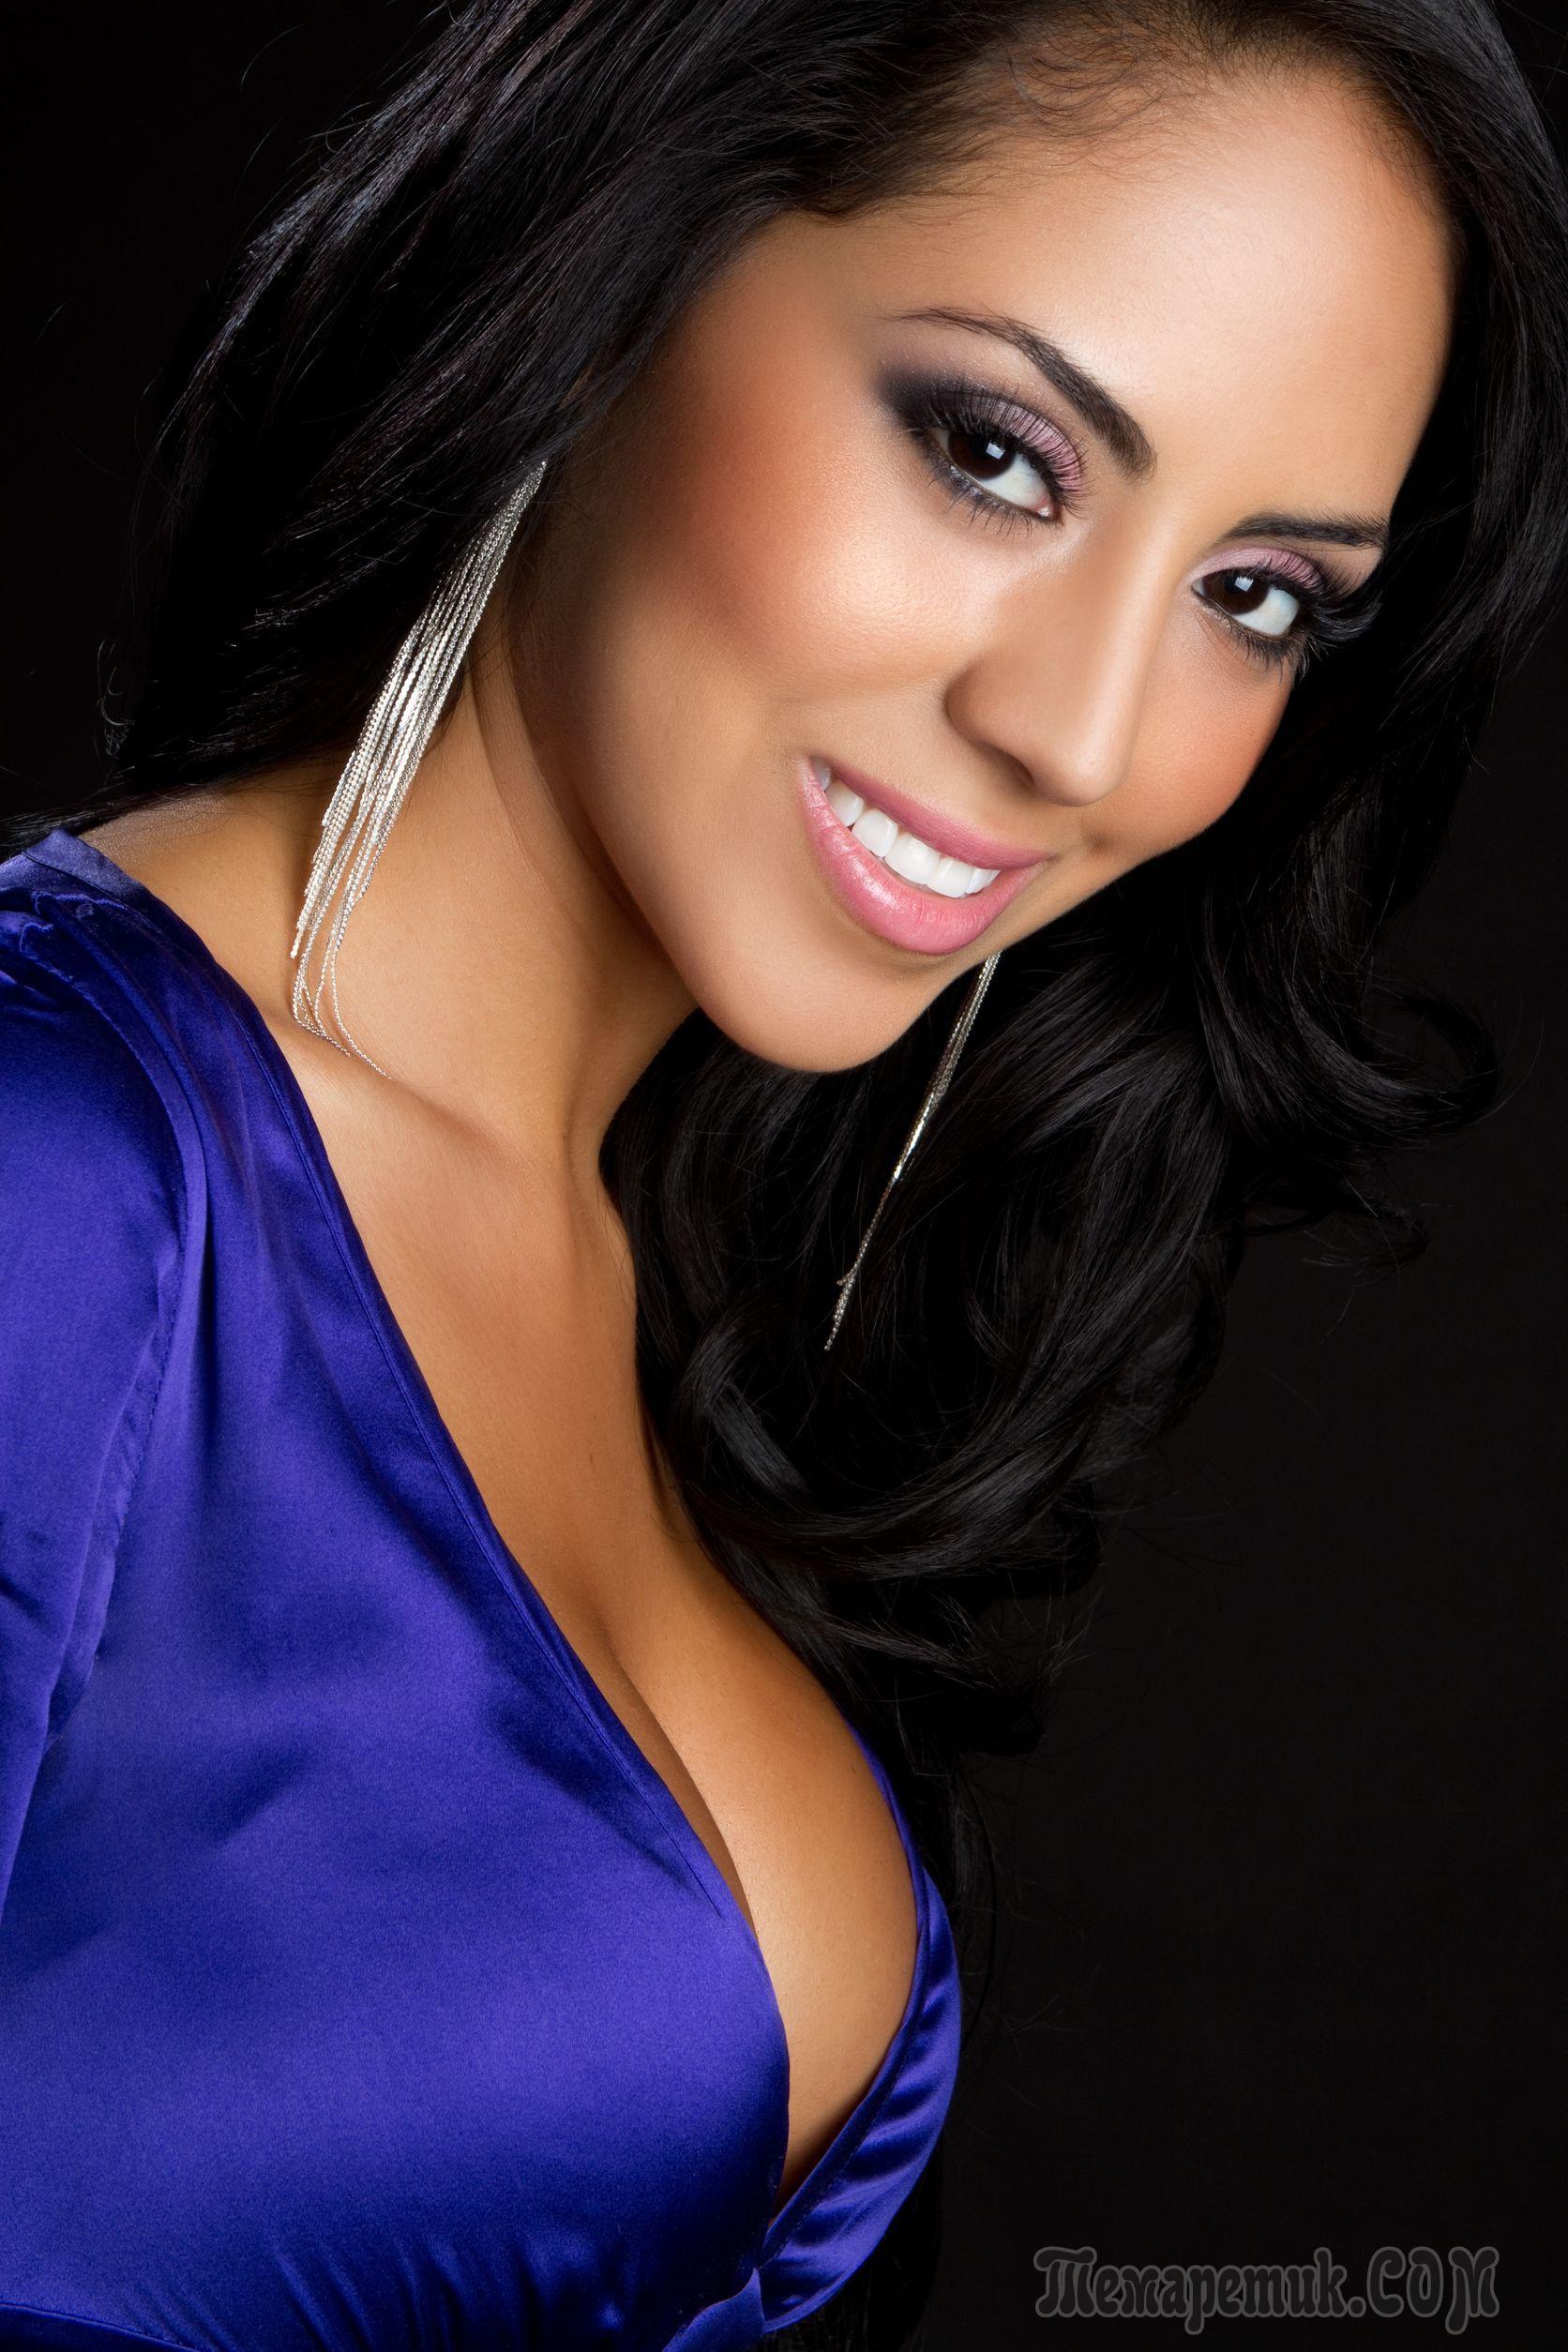 Rise of Interracial Dating: More Latina Women Dating